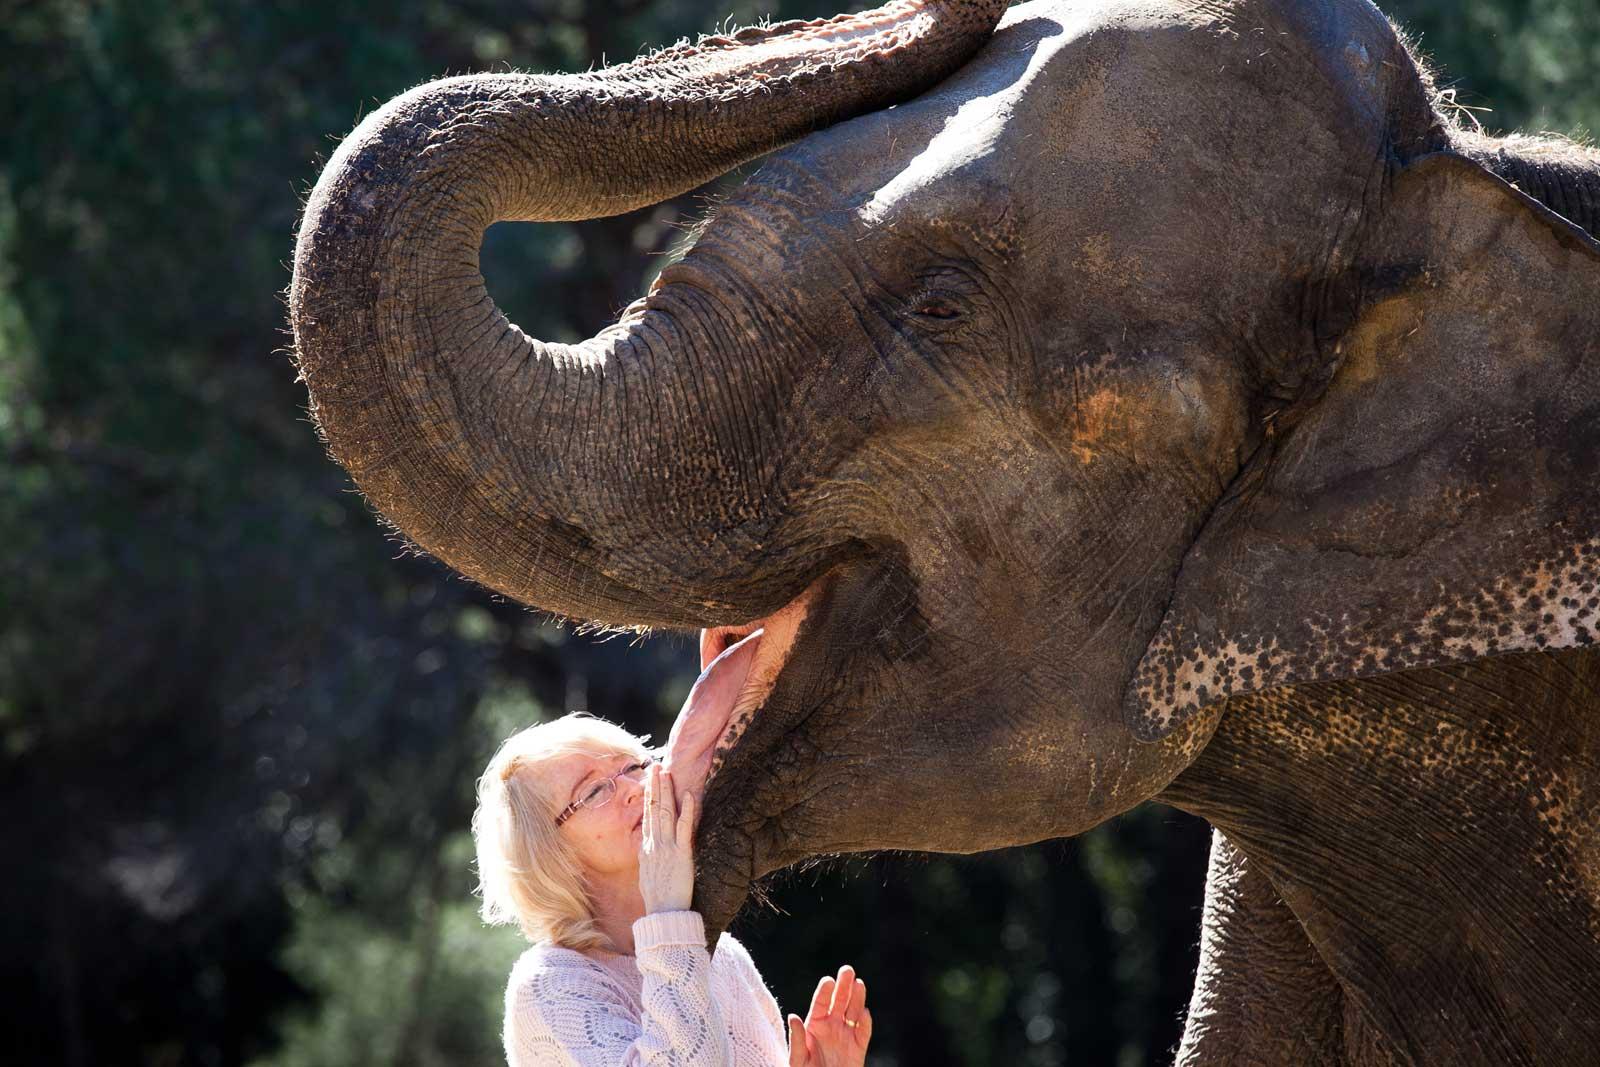 Yvonne Kludsky , ensinistradora d'elefants , amb la Dumba